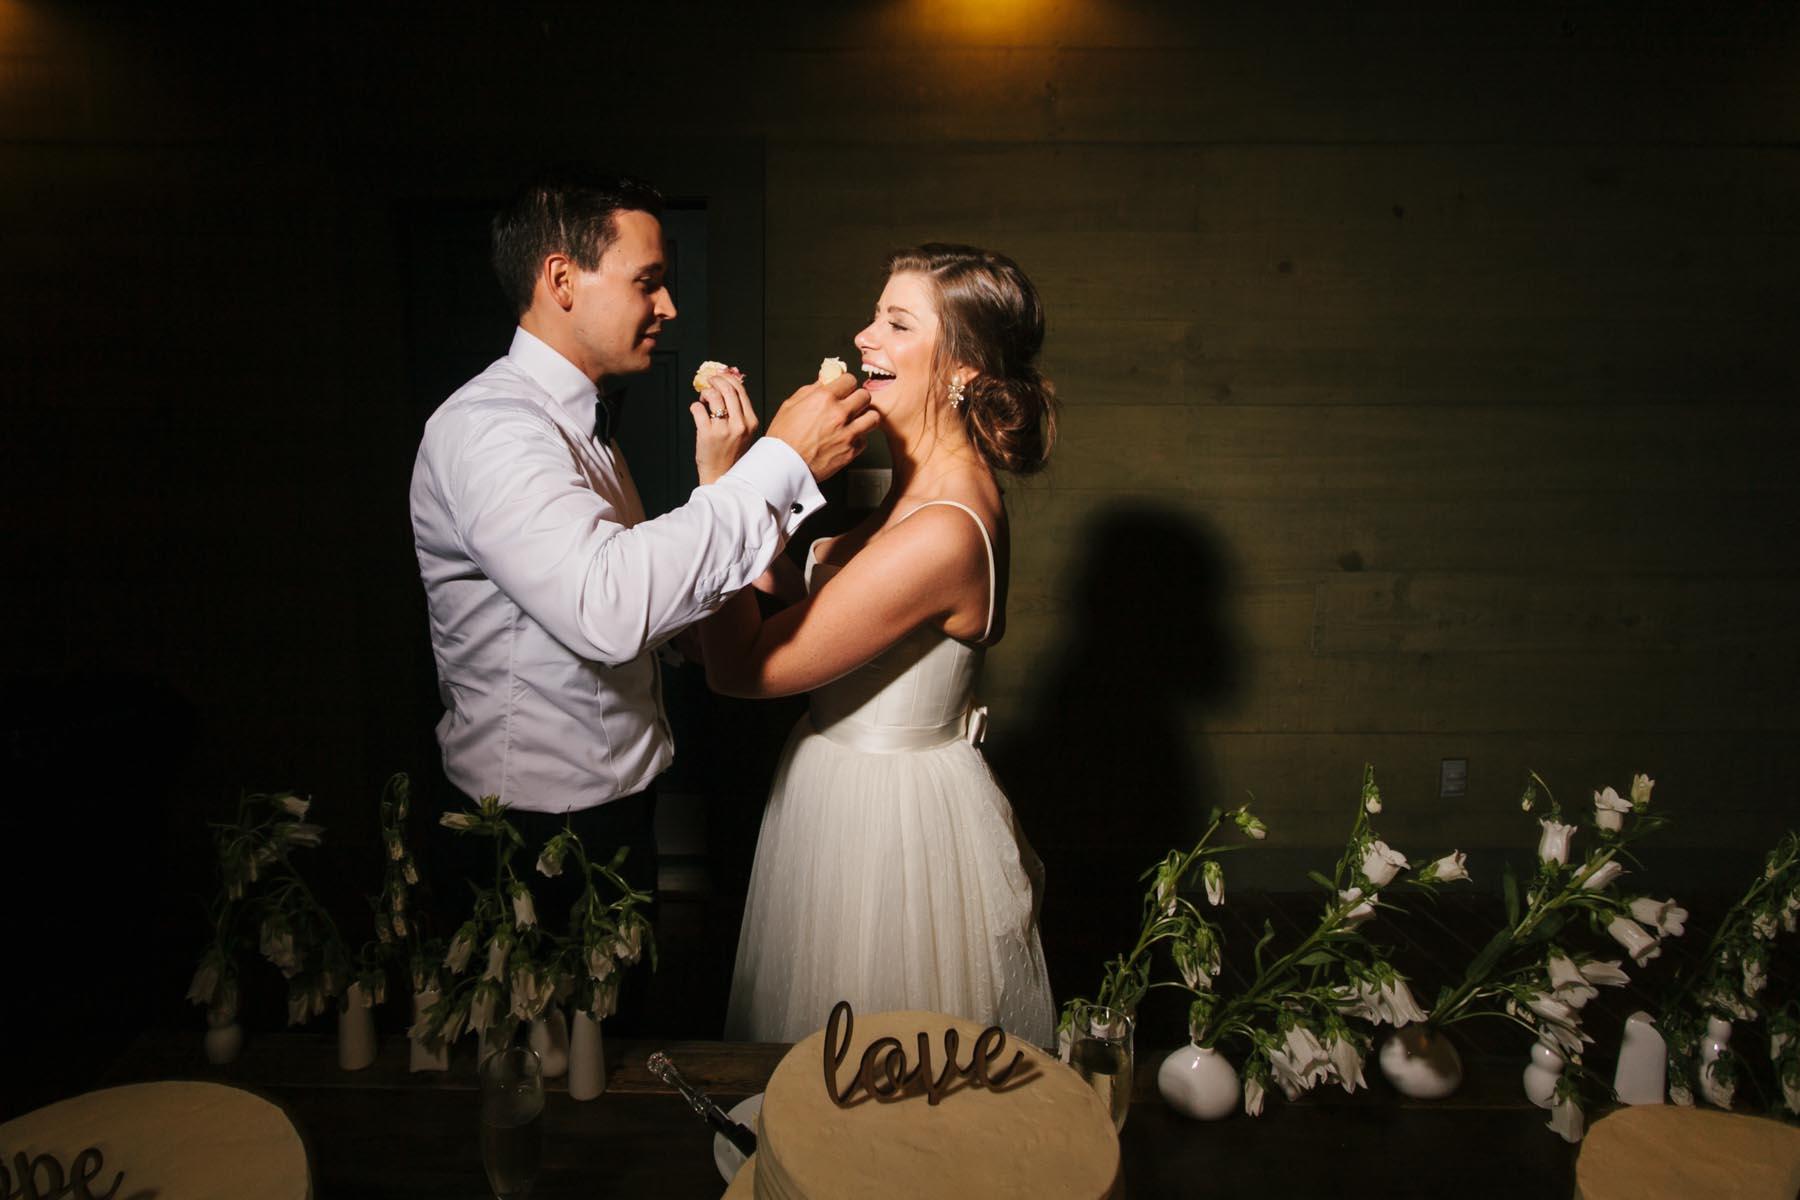 lowry wedding blog eden garden florida wedding-146